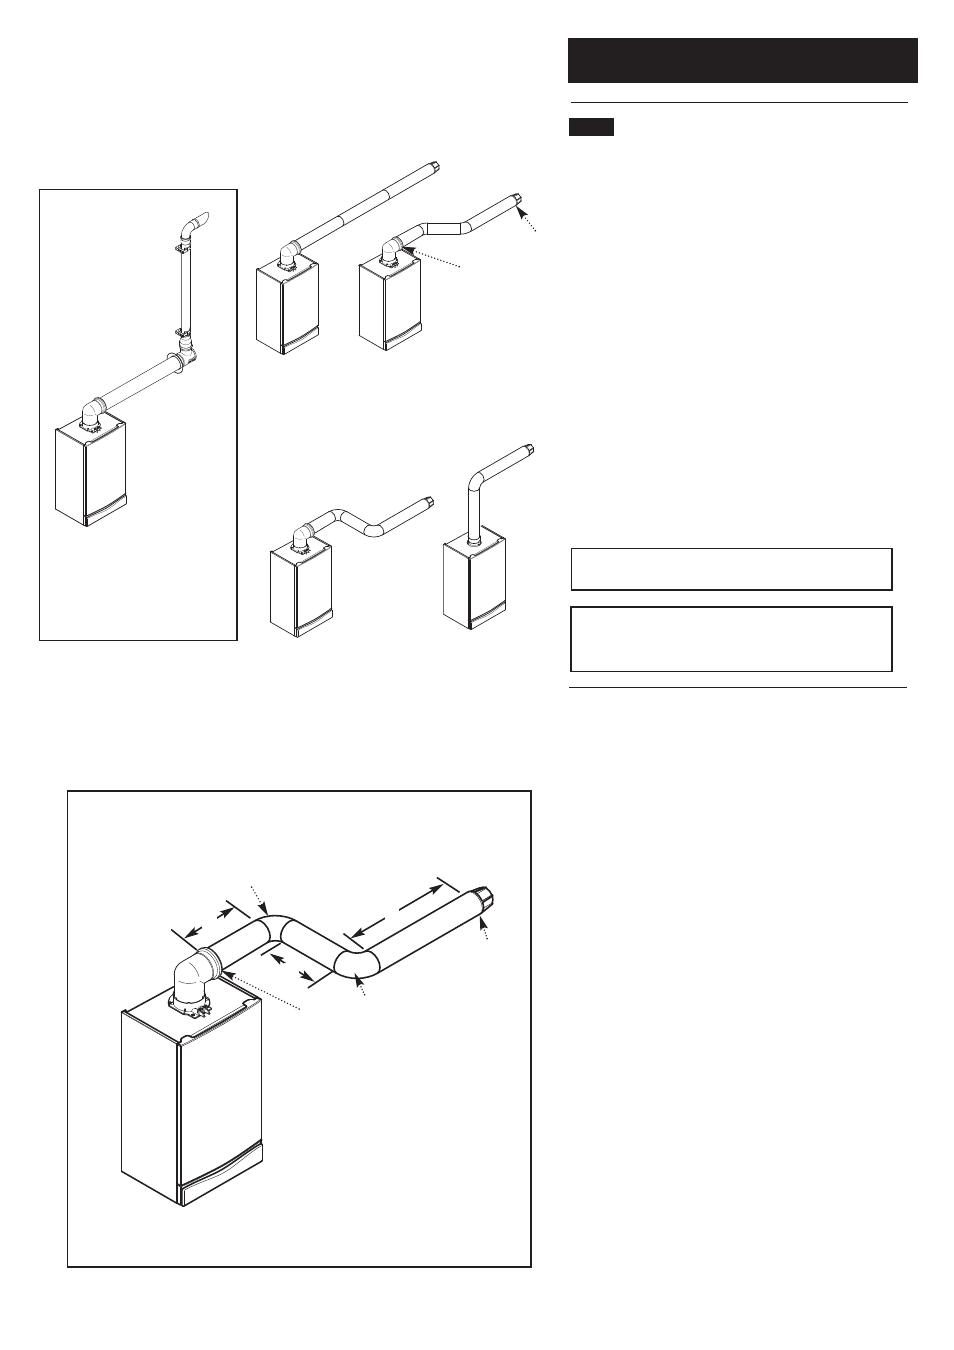 0 flue options baxi potterton heatmax combi he condensing 0 flue options baxi potterton heatmax combi he condensing combination boiler user manual page cheapraybanclubmaster Choice Image